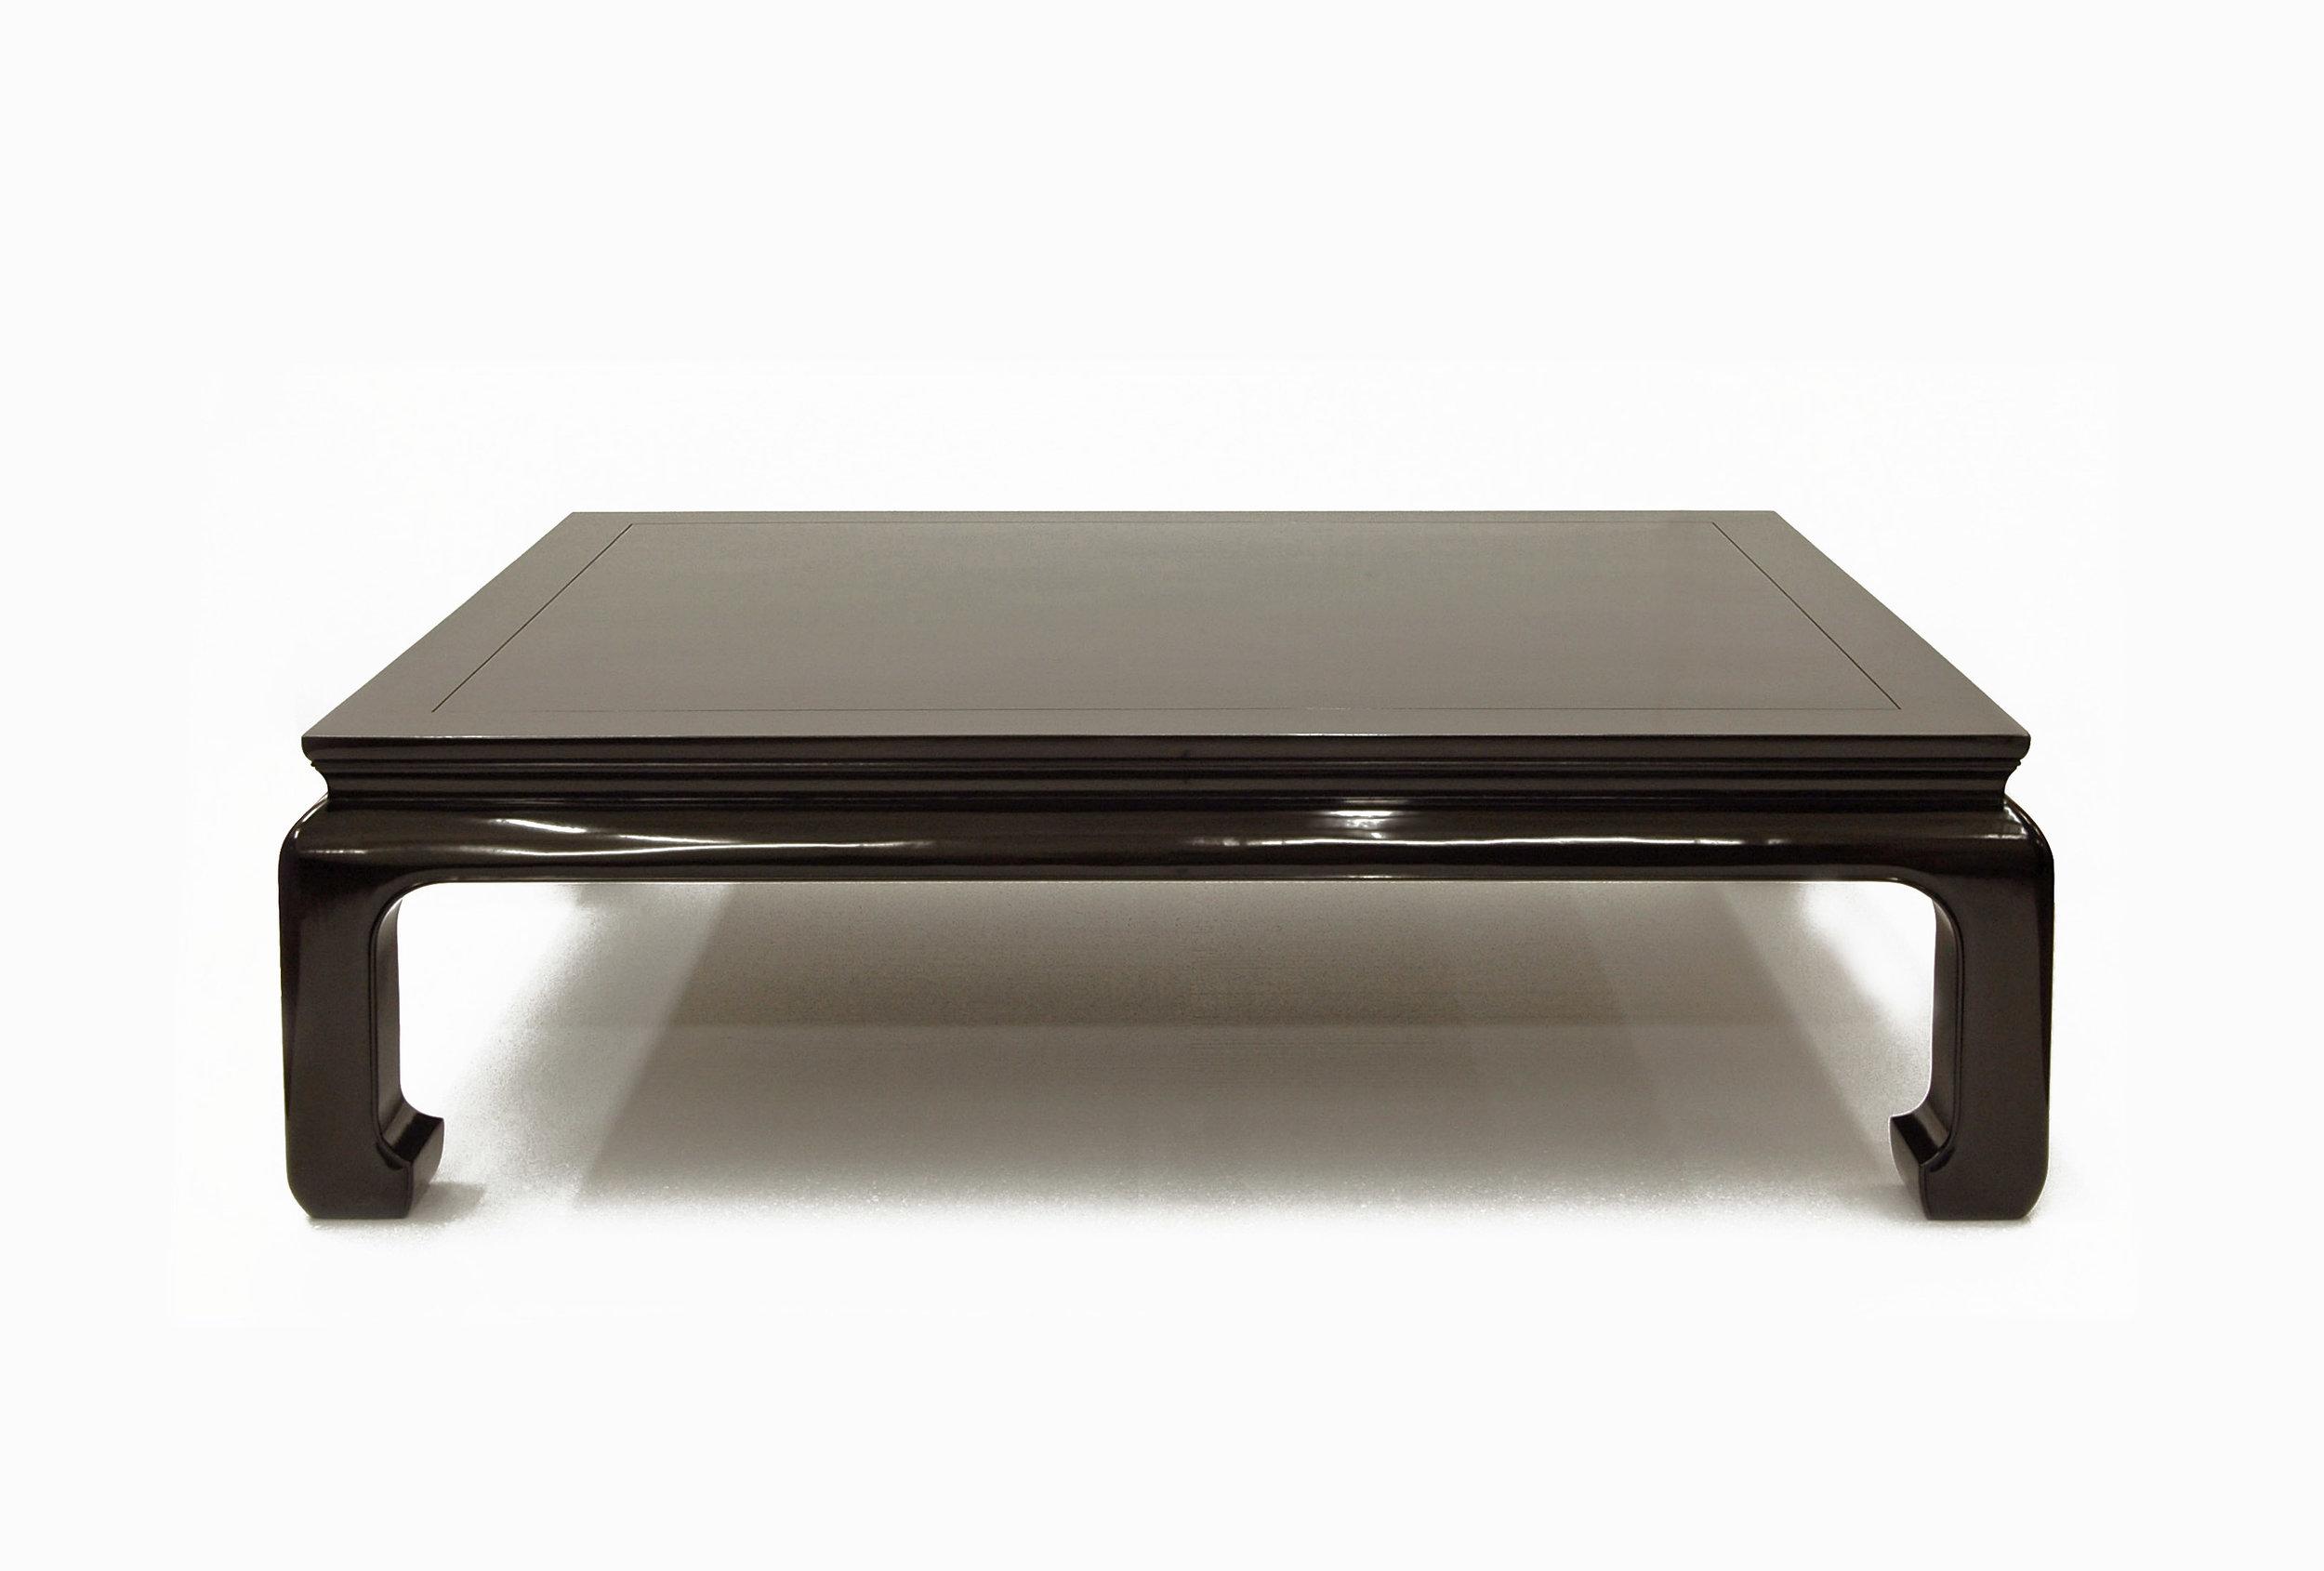 ....bespoke chinese ming style furniture   rosewood london : coffee table..特别定制中式明式家具   瑰丽伦敦酒店:咖啡台....